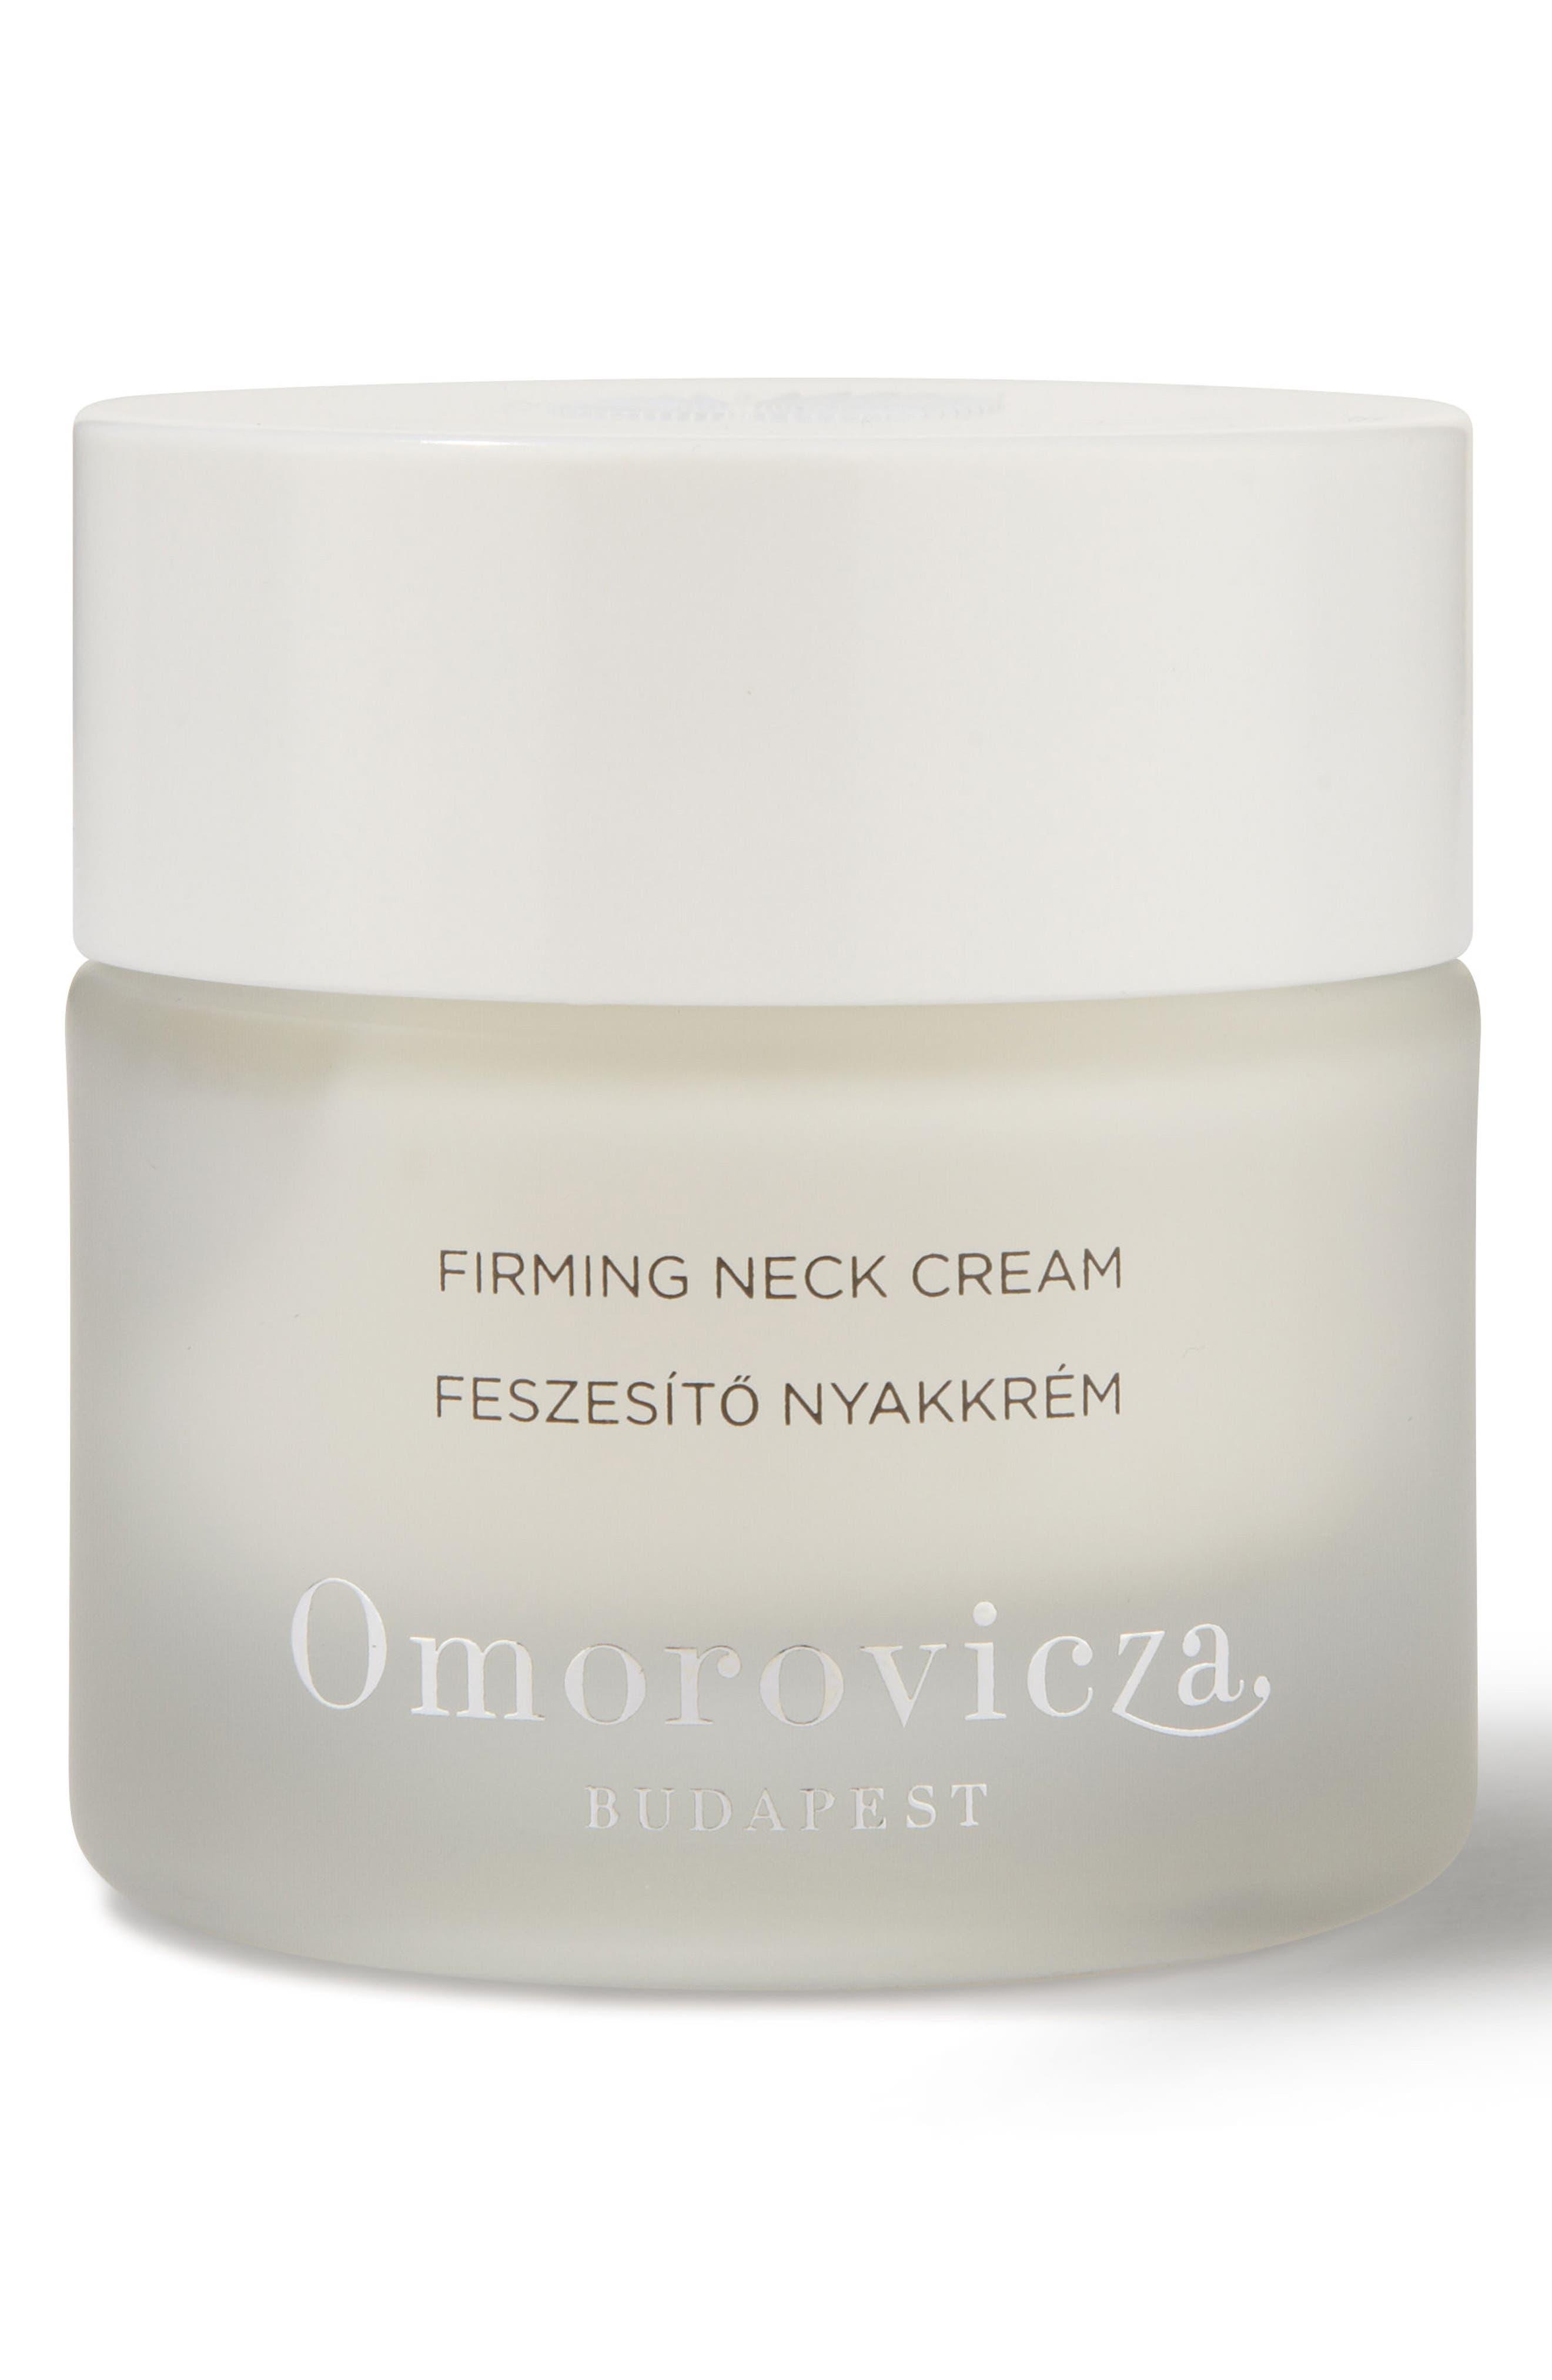 Firming Neck Cream,                             Main thumbnail 1, color,                             No Color